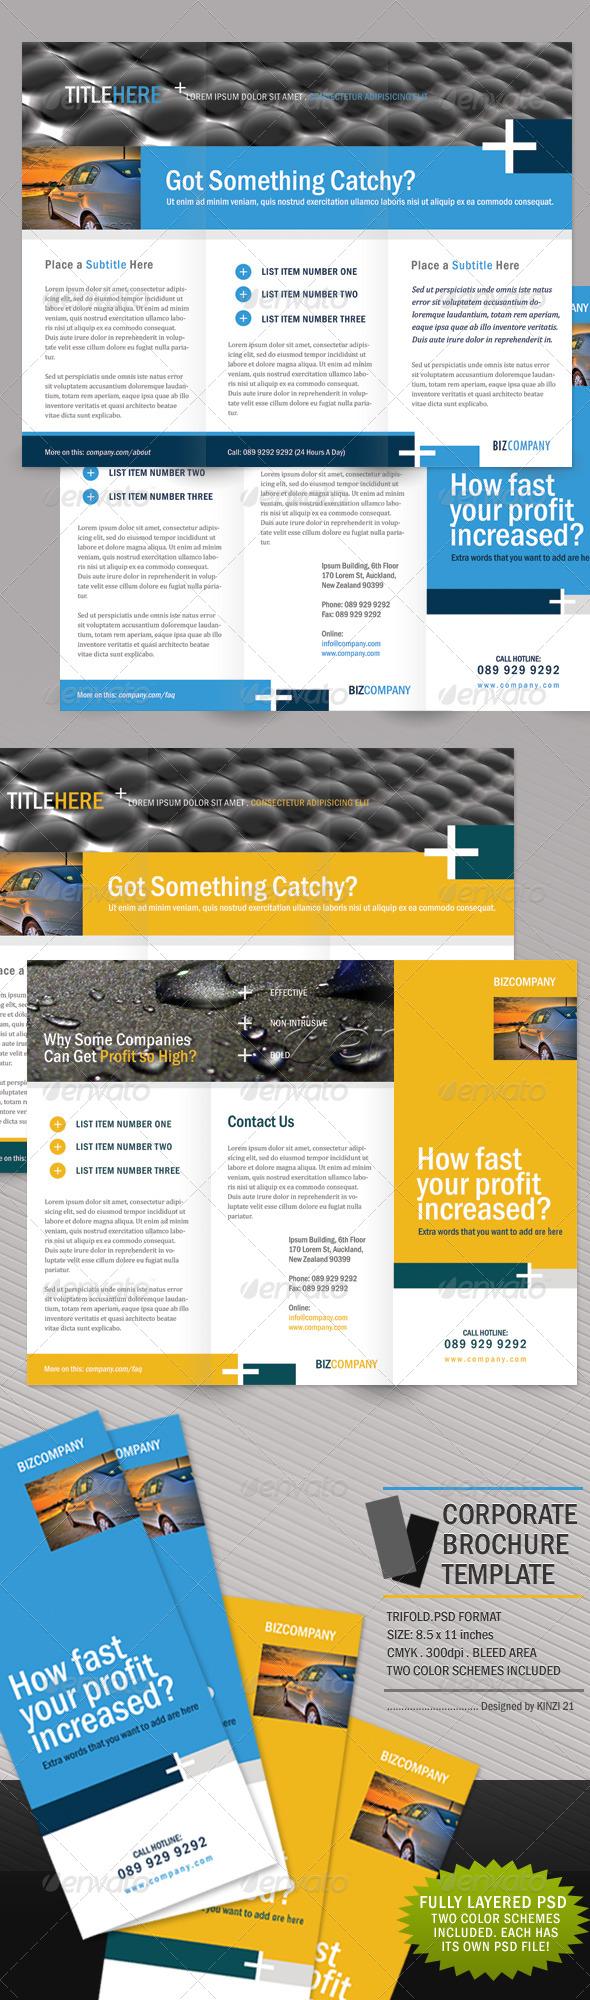 Clean Corporate Brochure - Trifold - Corporate Brochures